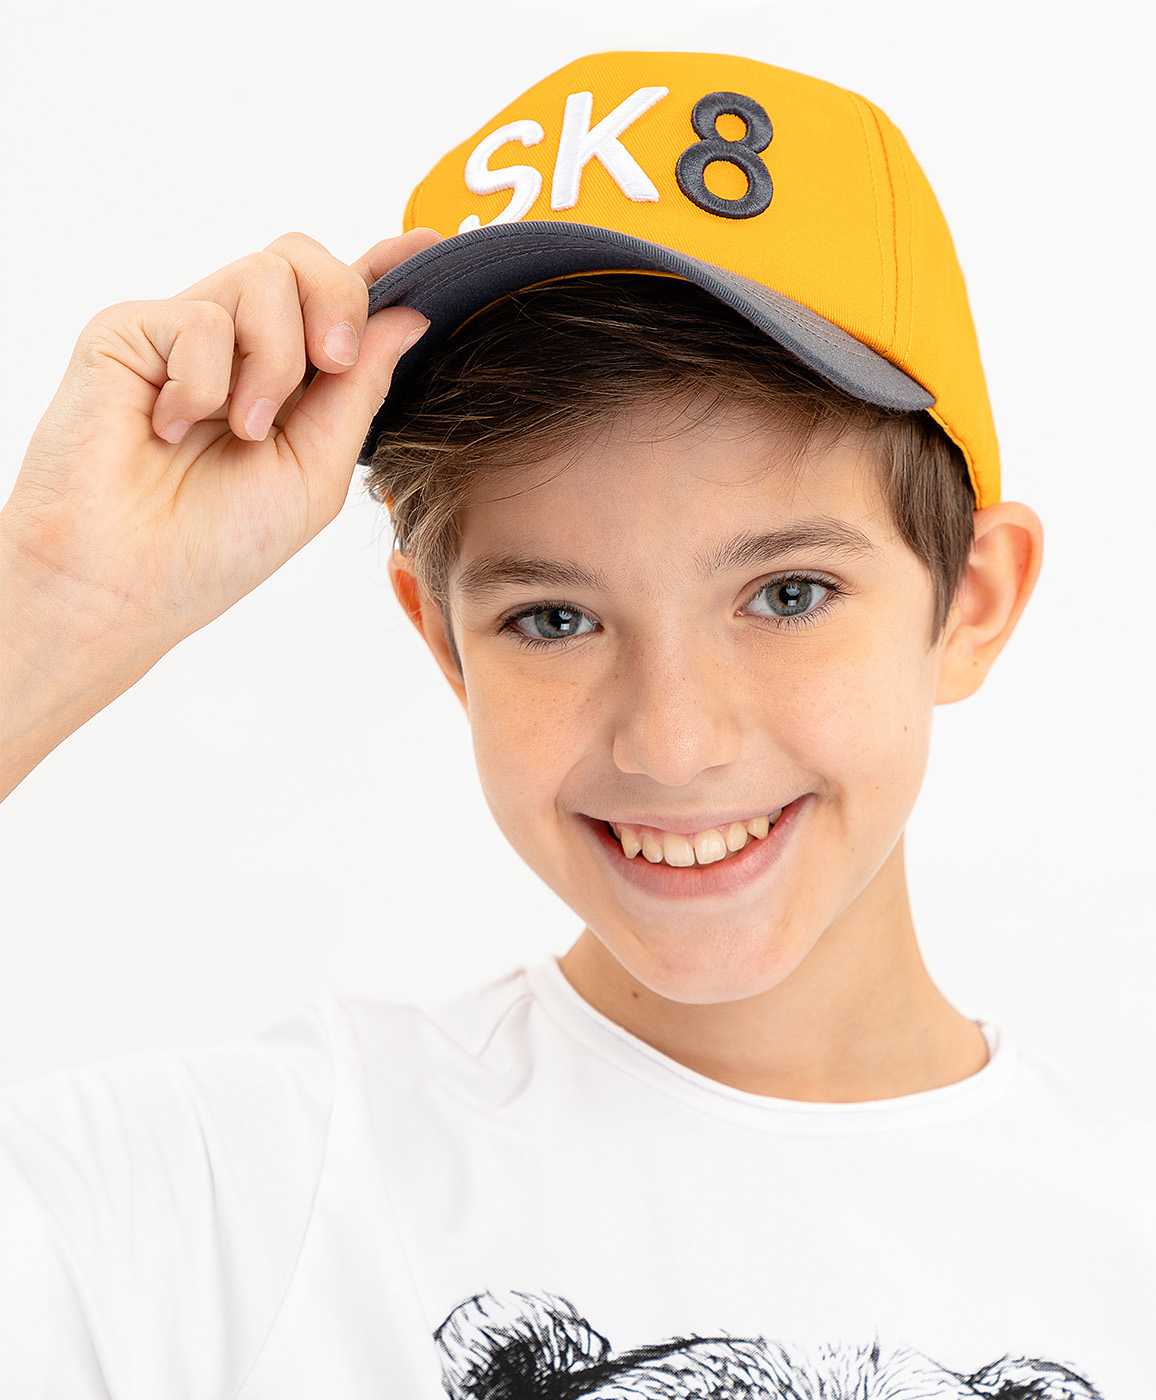 Купить 120BBBF71012700, Желтая бейсболка Button Blue, желтый, 50-52, Мужской, ВЕСНА/ЛЕТО 2020 (shop: GulliverMarket Gulliver Market)